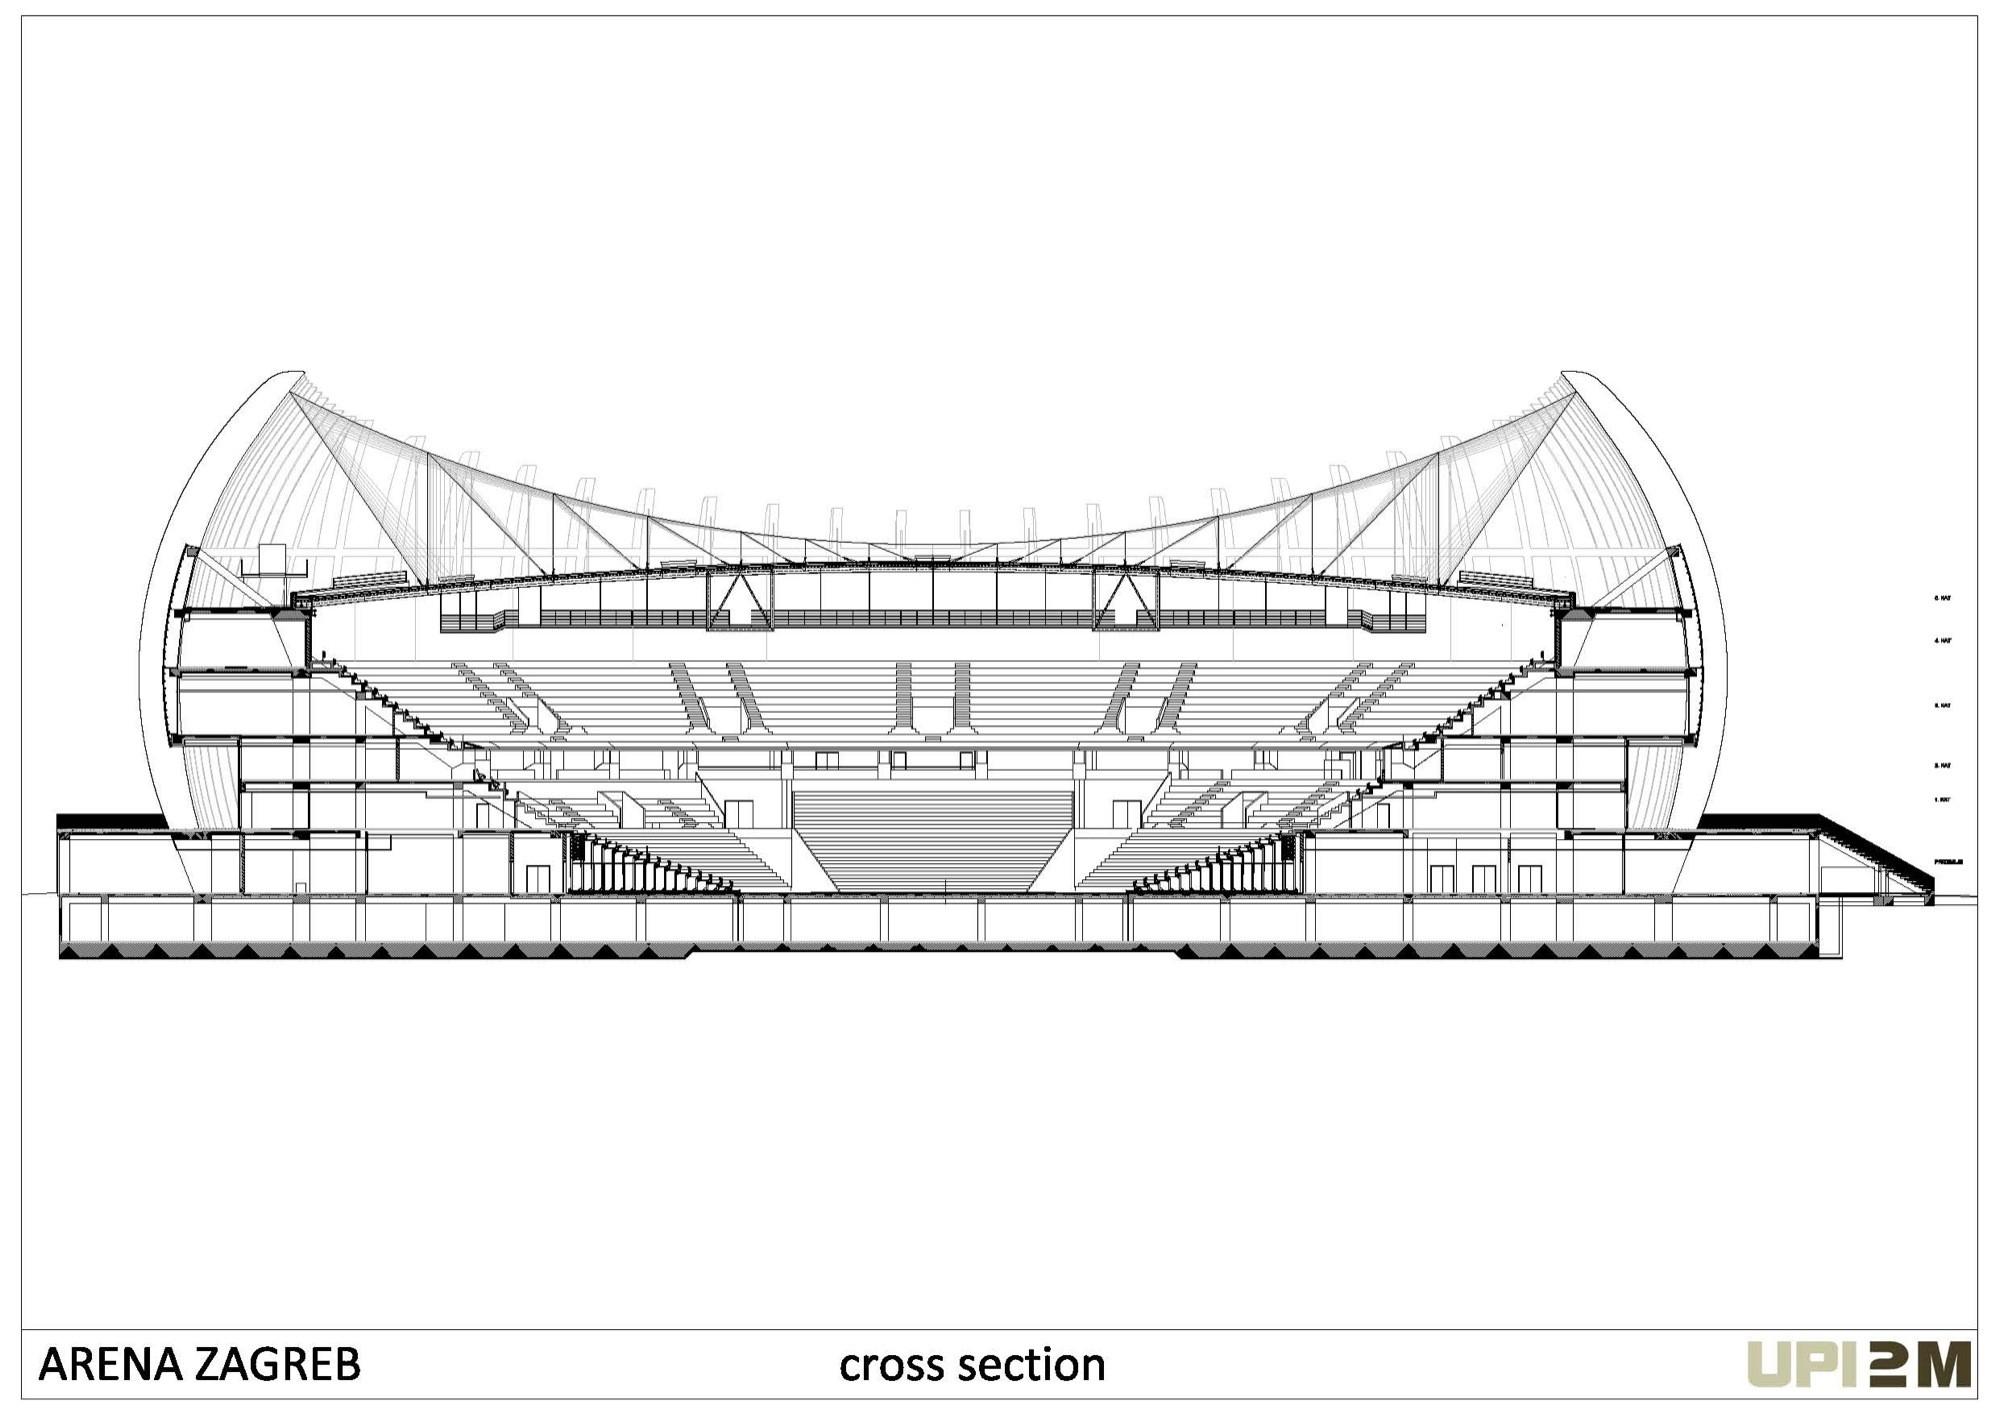 O2 London Floor Plan Gallery Of Arena Zagreb Upi 2m 41